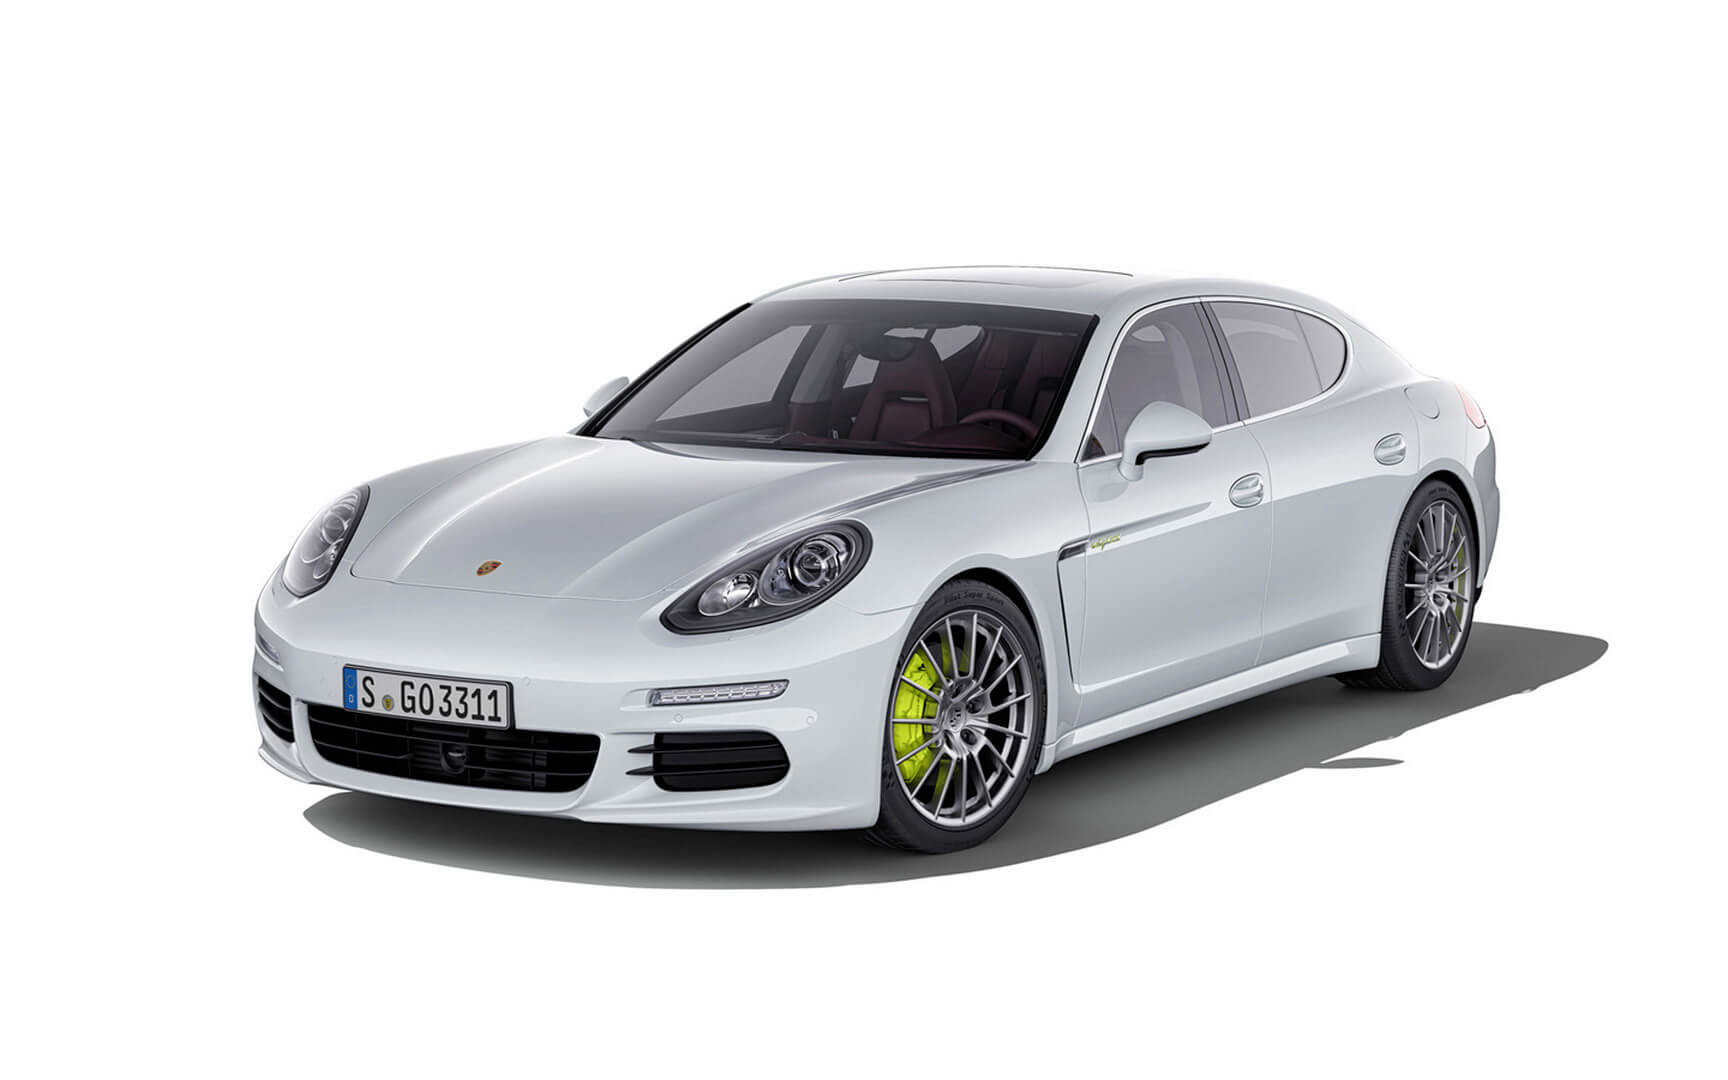 Фотография экоавто Porsche Panamera S E-Hybrid